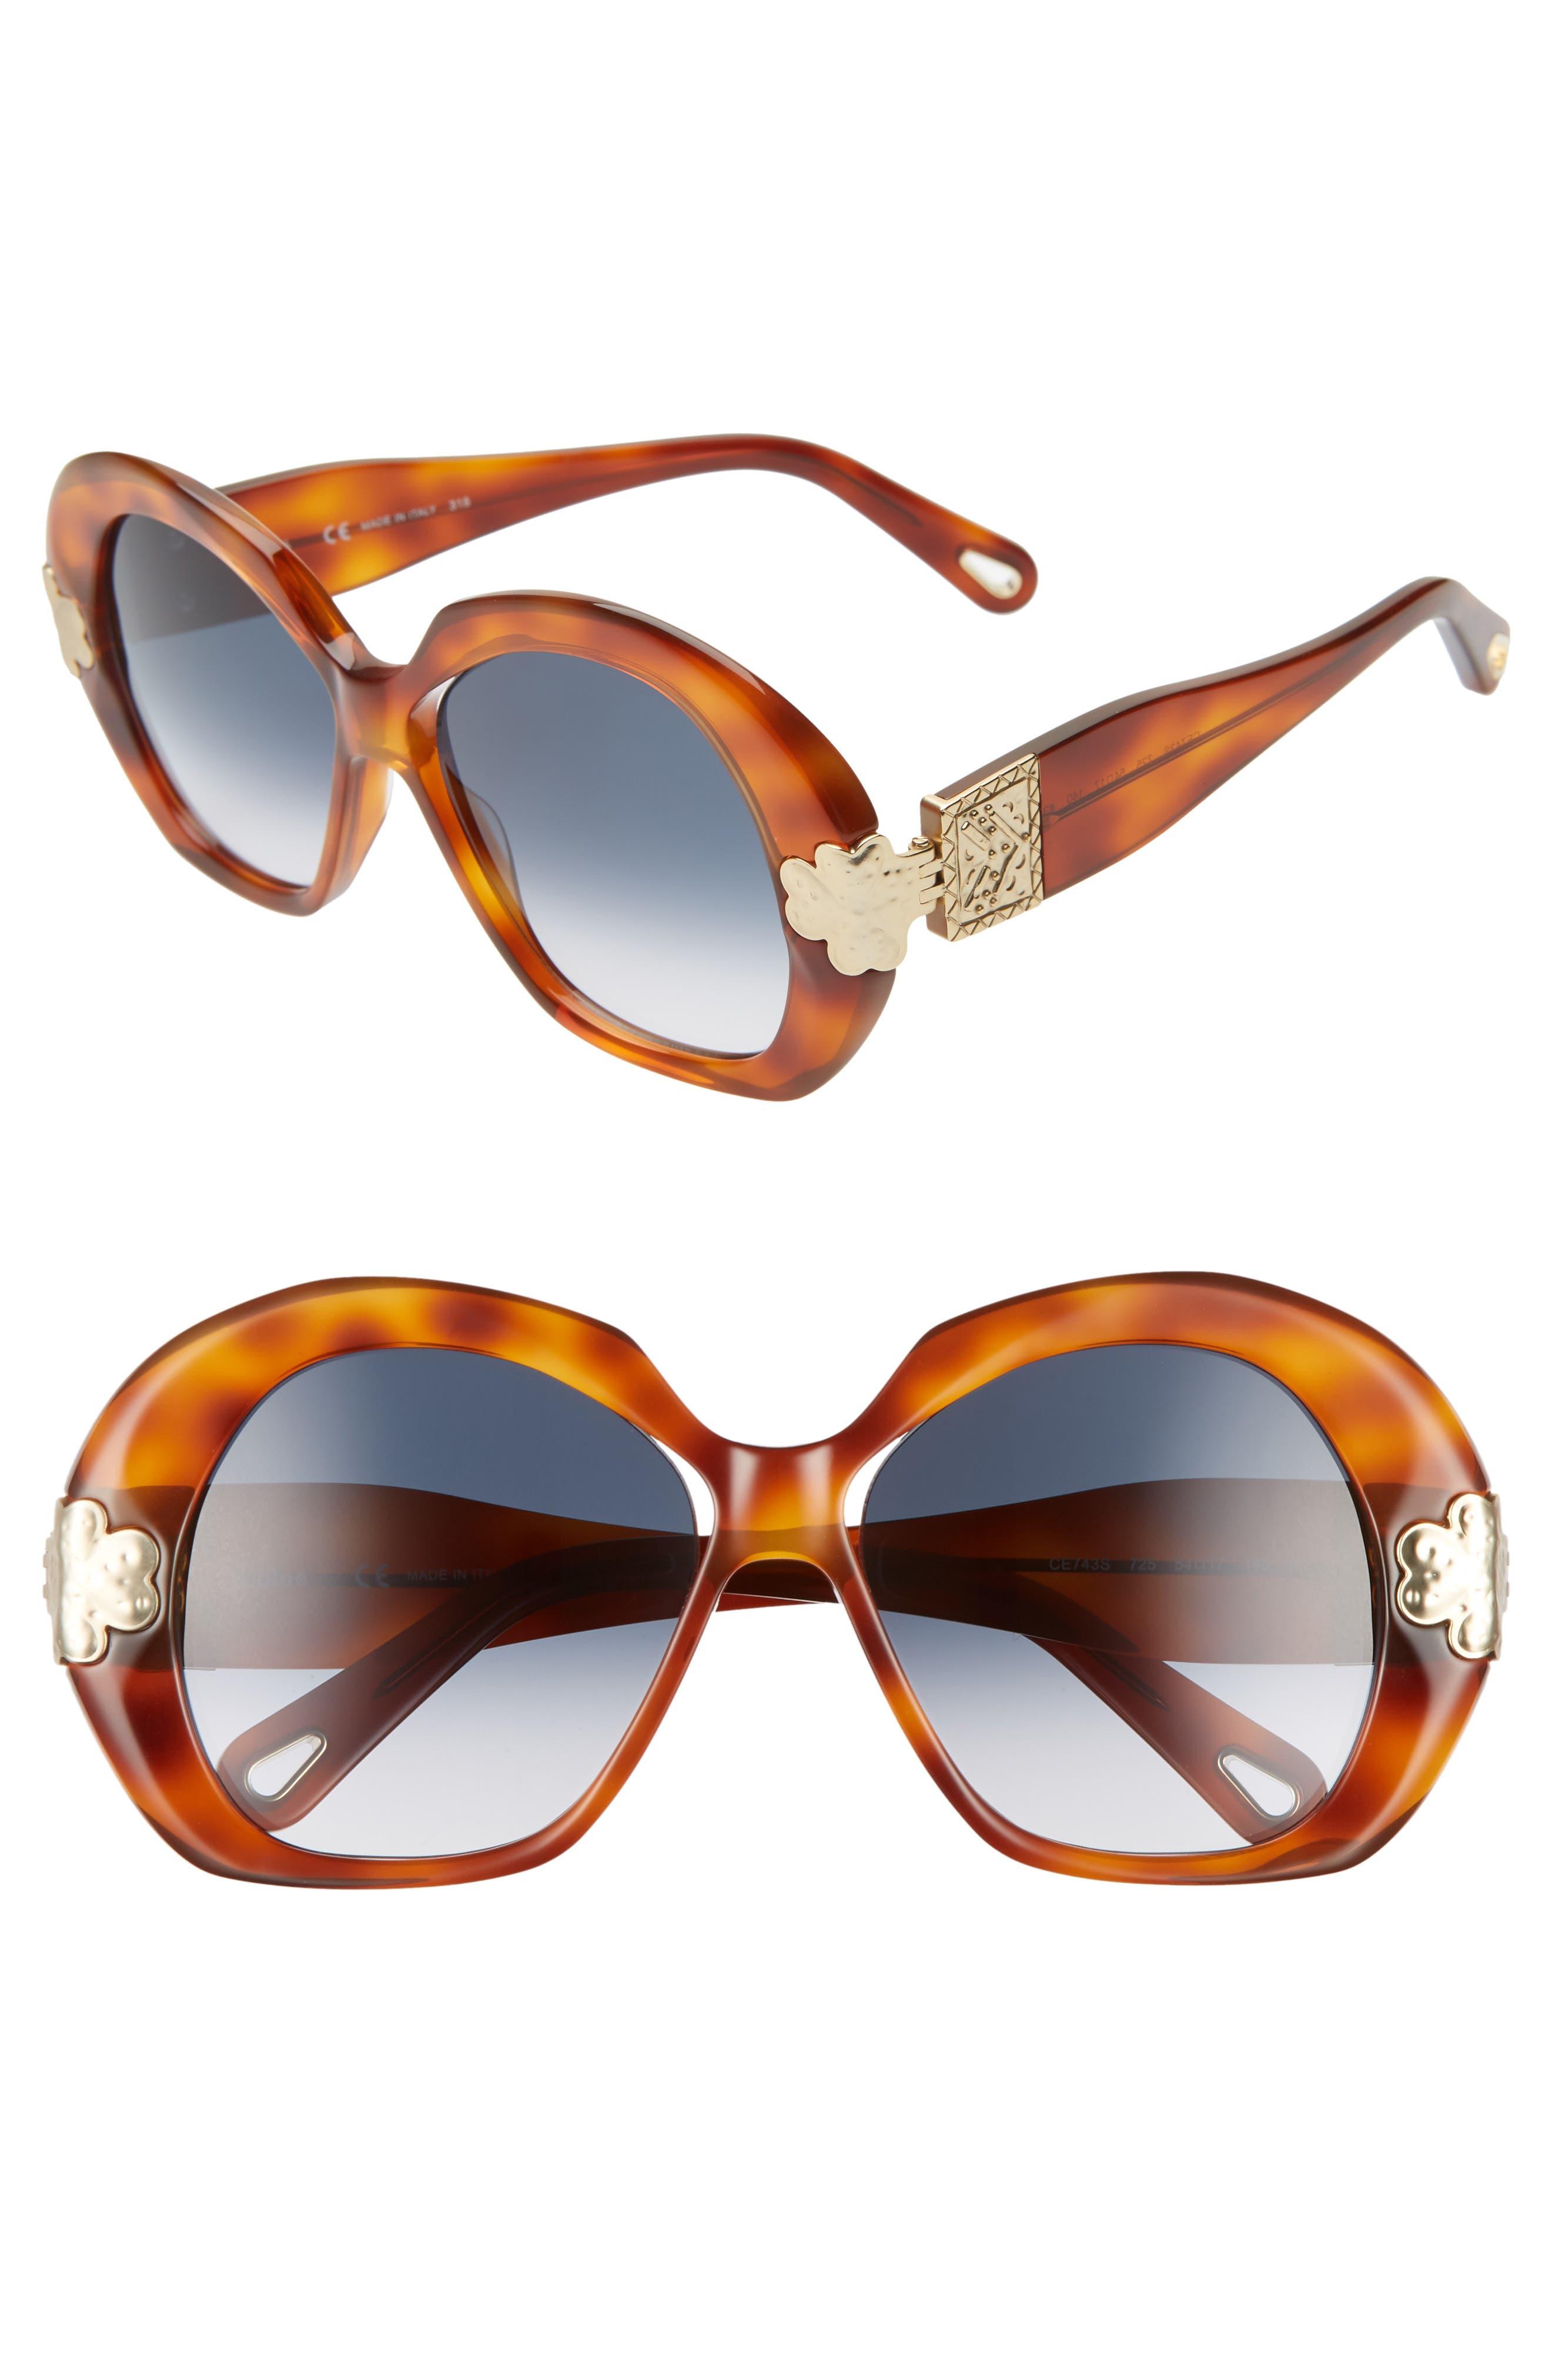 Chloe 5m Oval Sunglasses - Blonde Havana